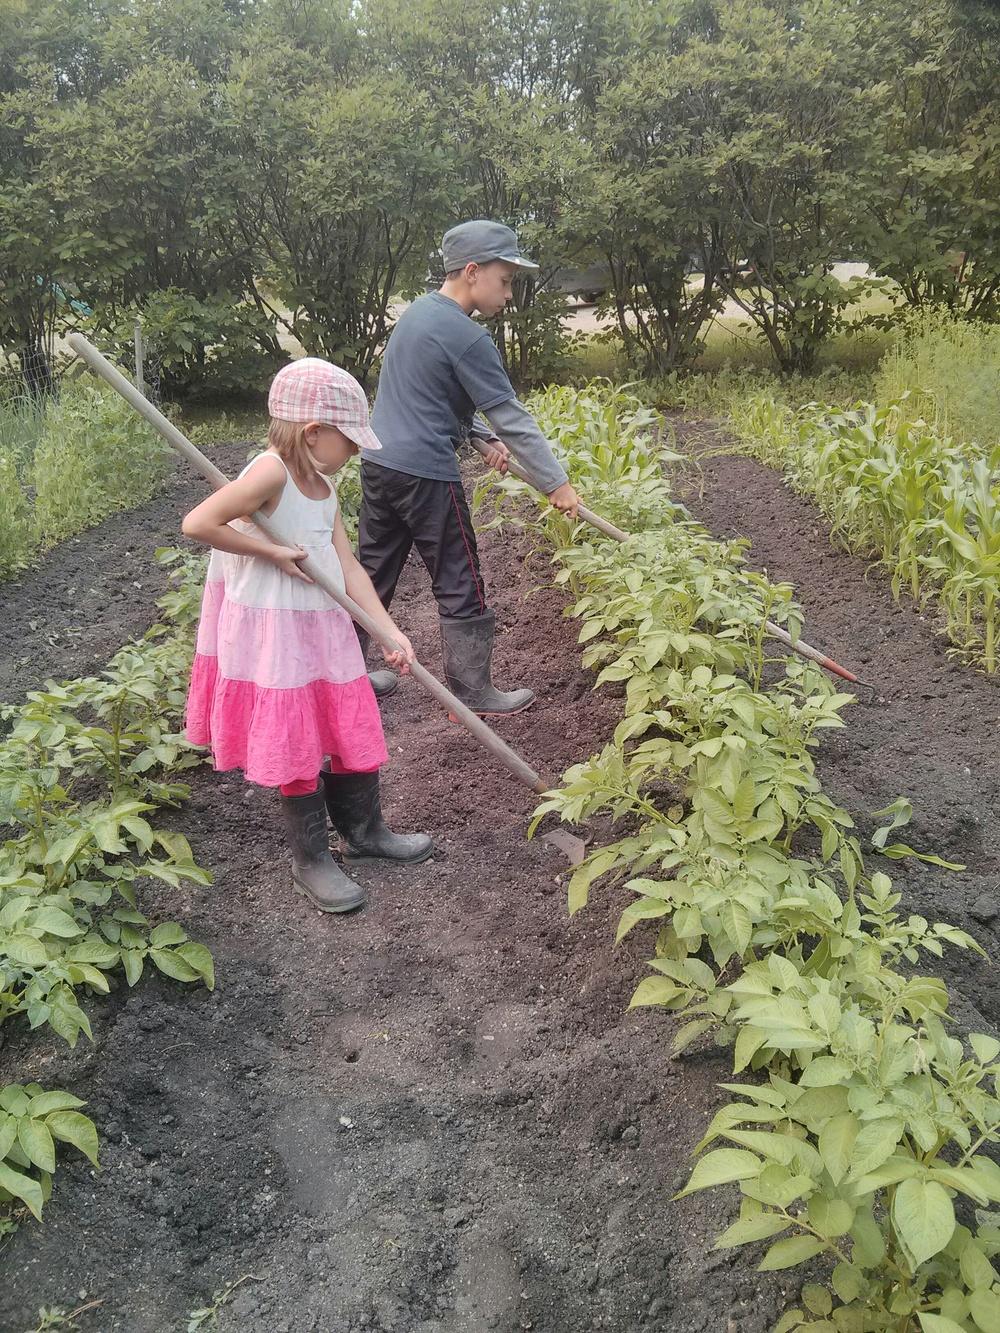 Doing their share in the Barkman garden